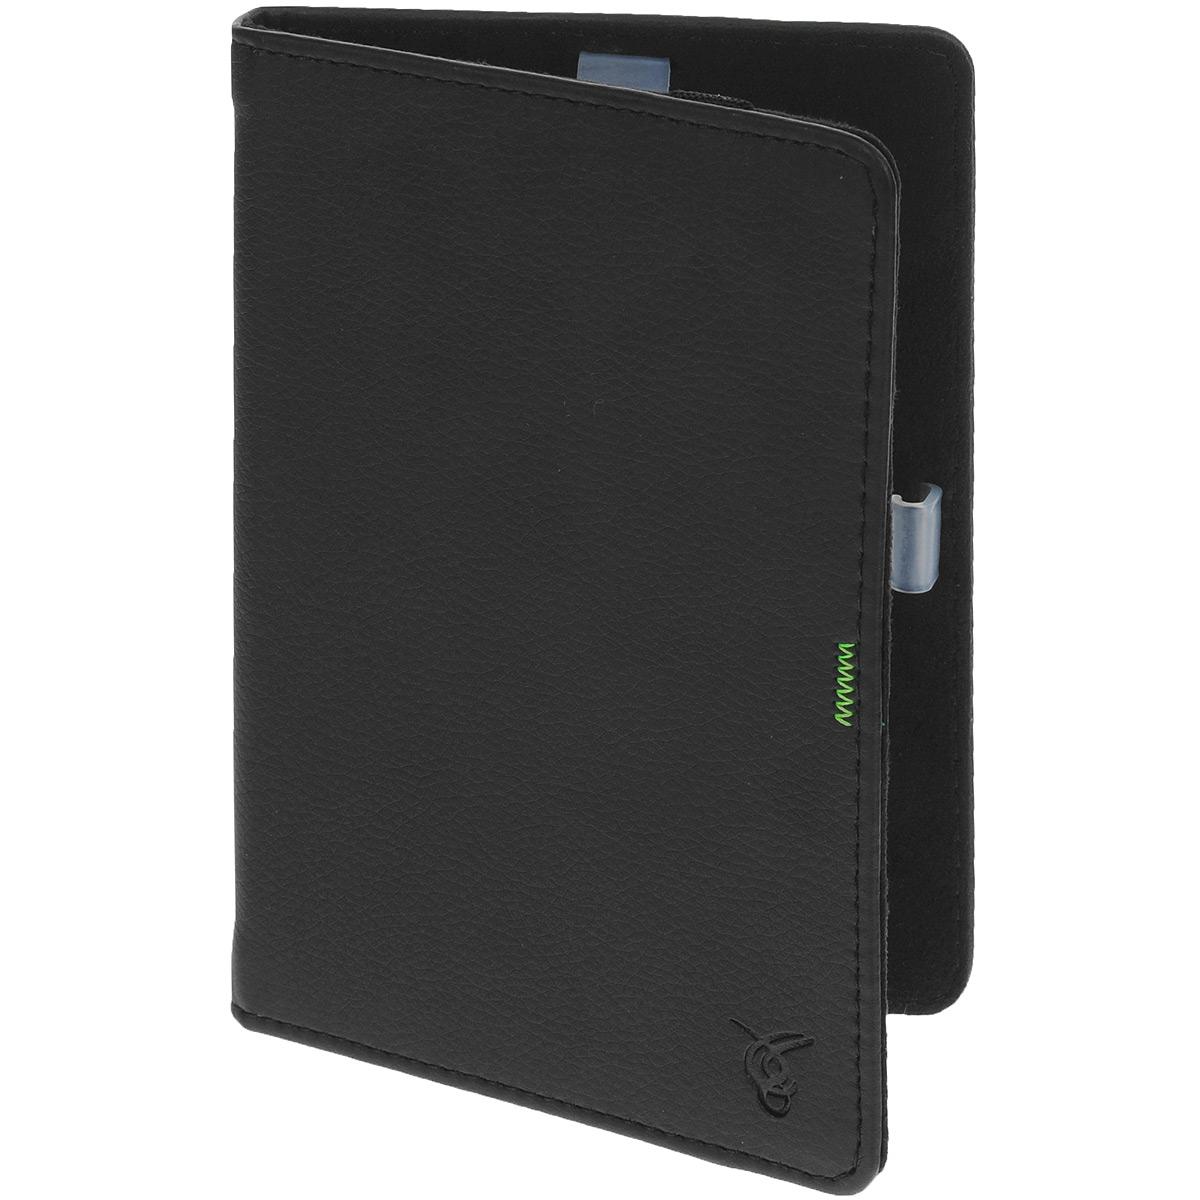 Vivacase GreenLine чехол-обложка для PocketBook 640/626/624/614/623/622, Black (VPB-FP622Bl)